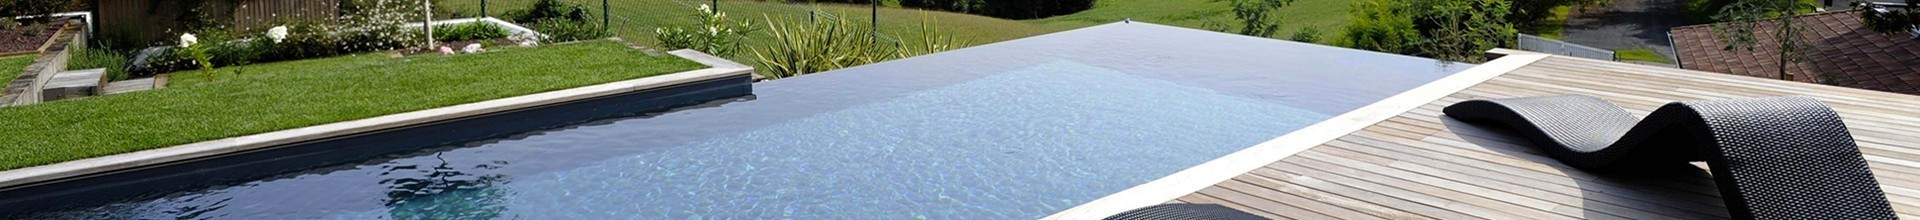 Direct usine, piscine coque prix Finistère